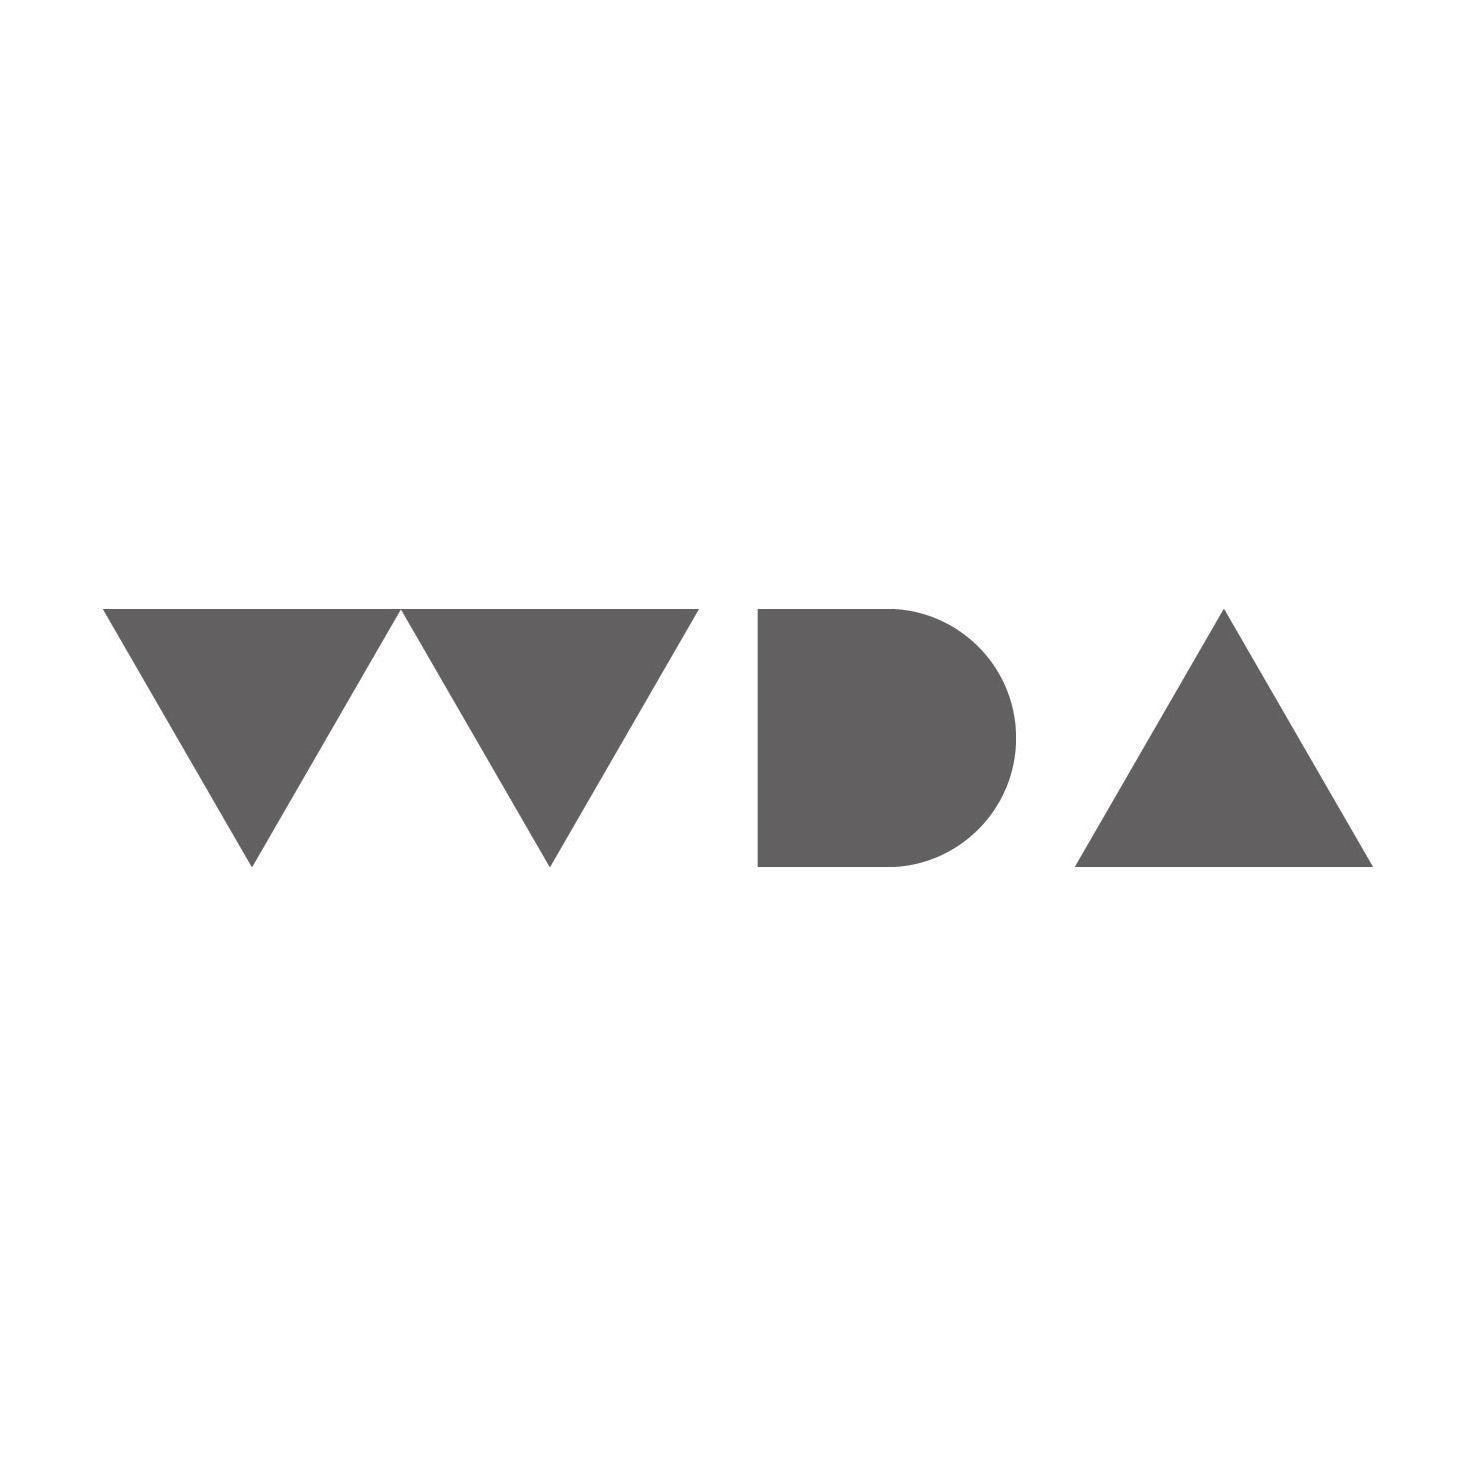 W.D.A